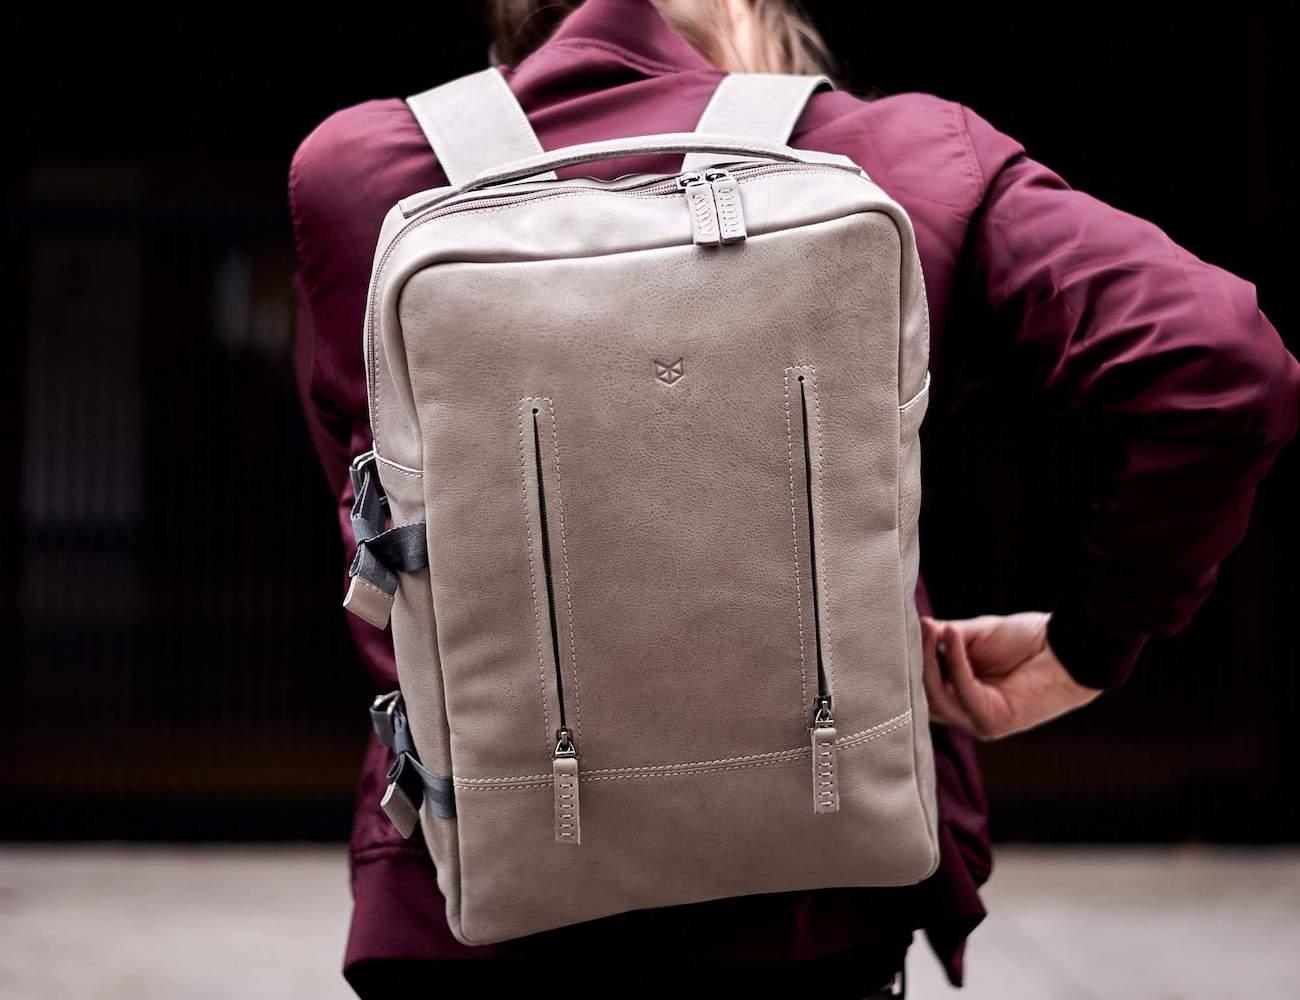 Capra Leather Tamarao Handmade Leather Backpack